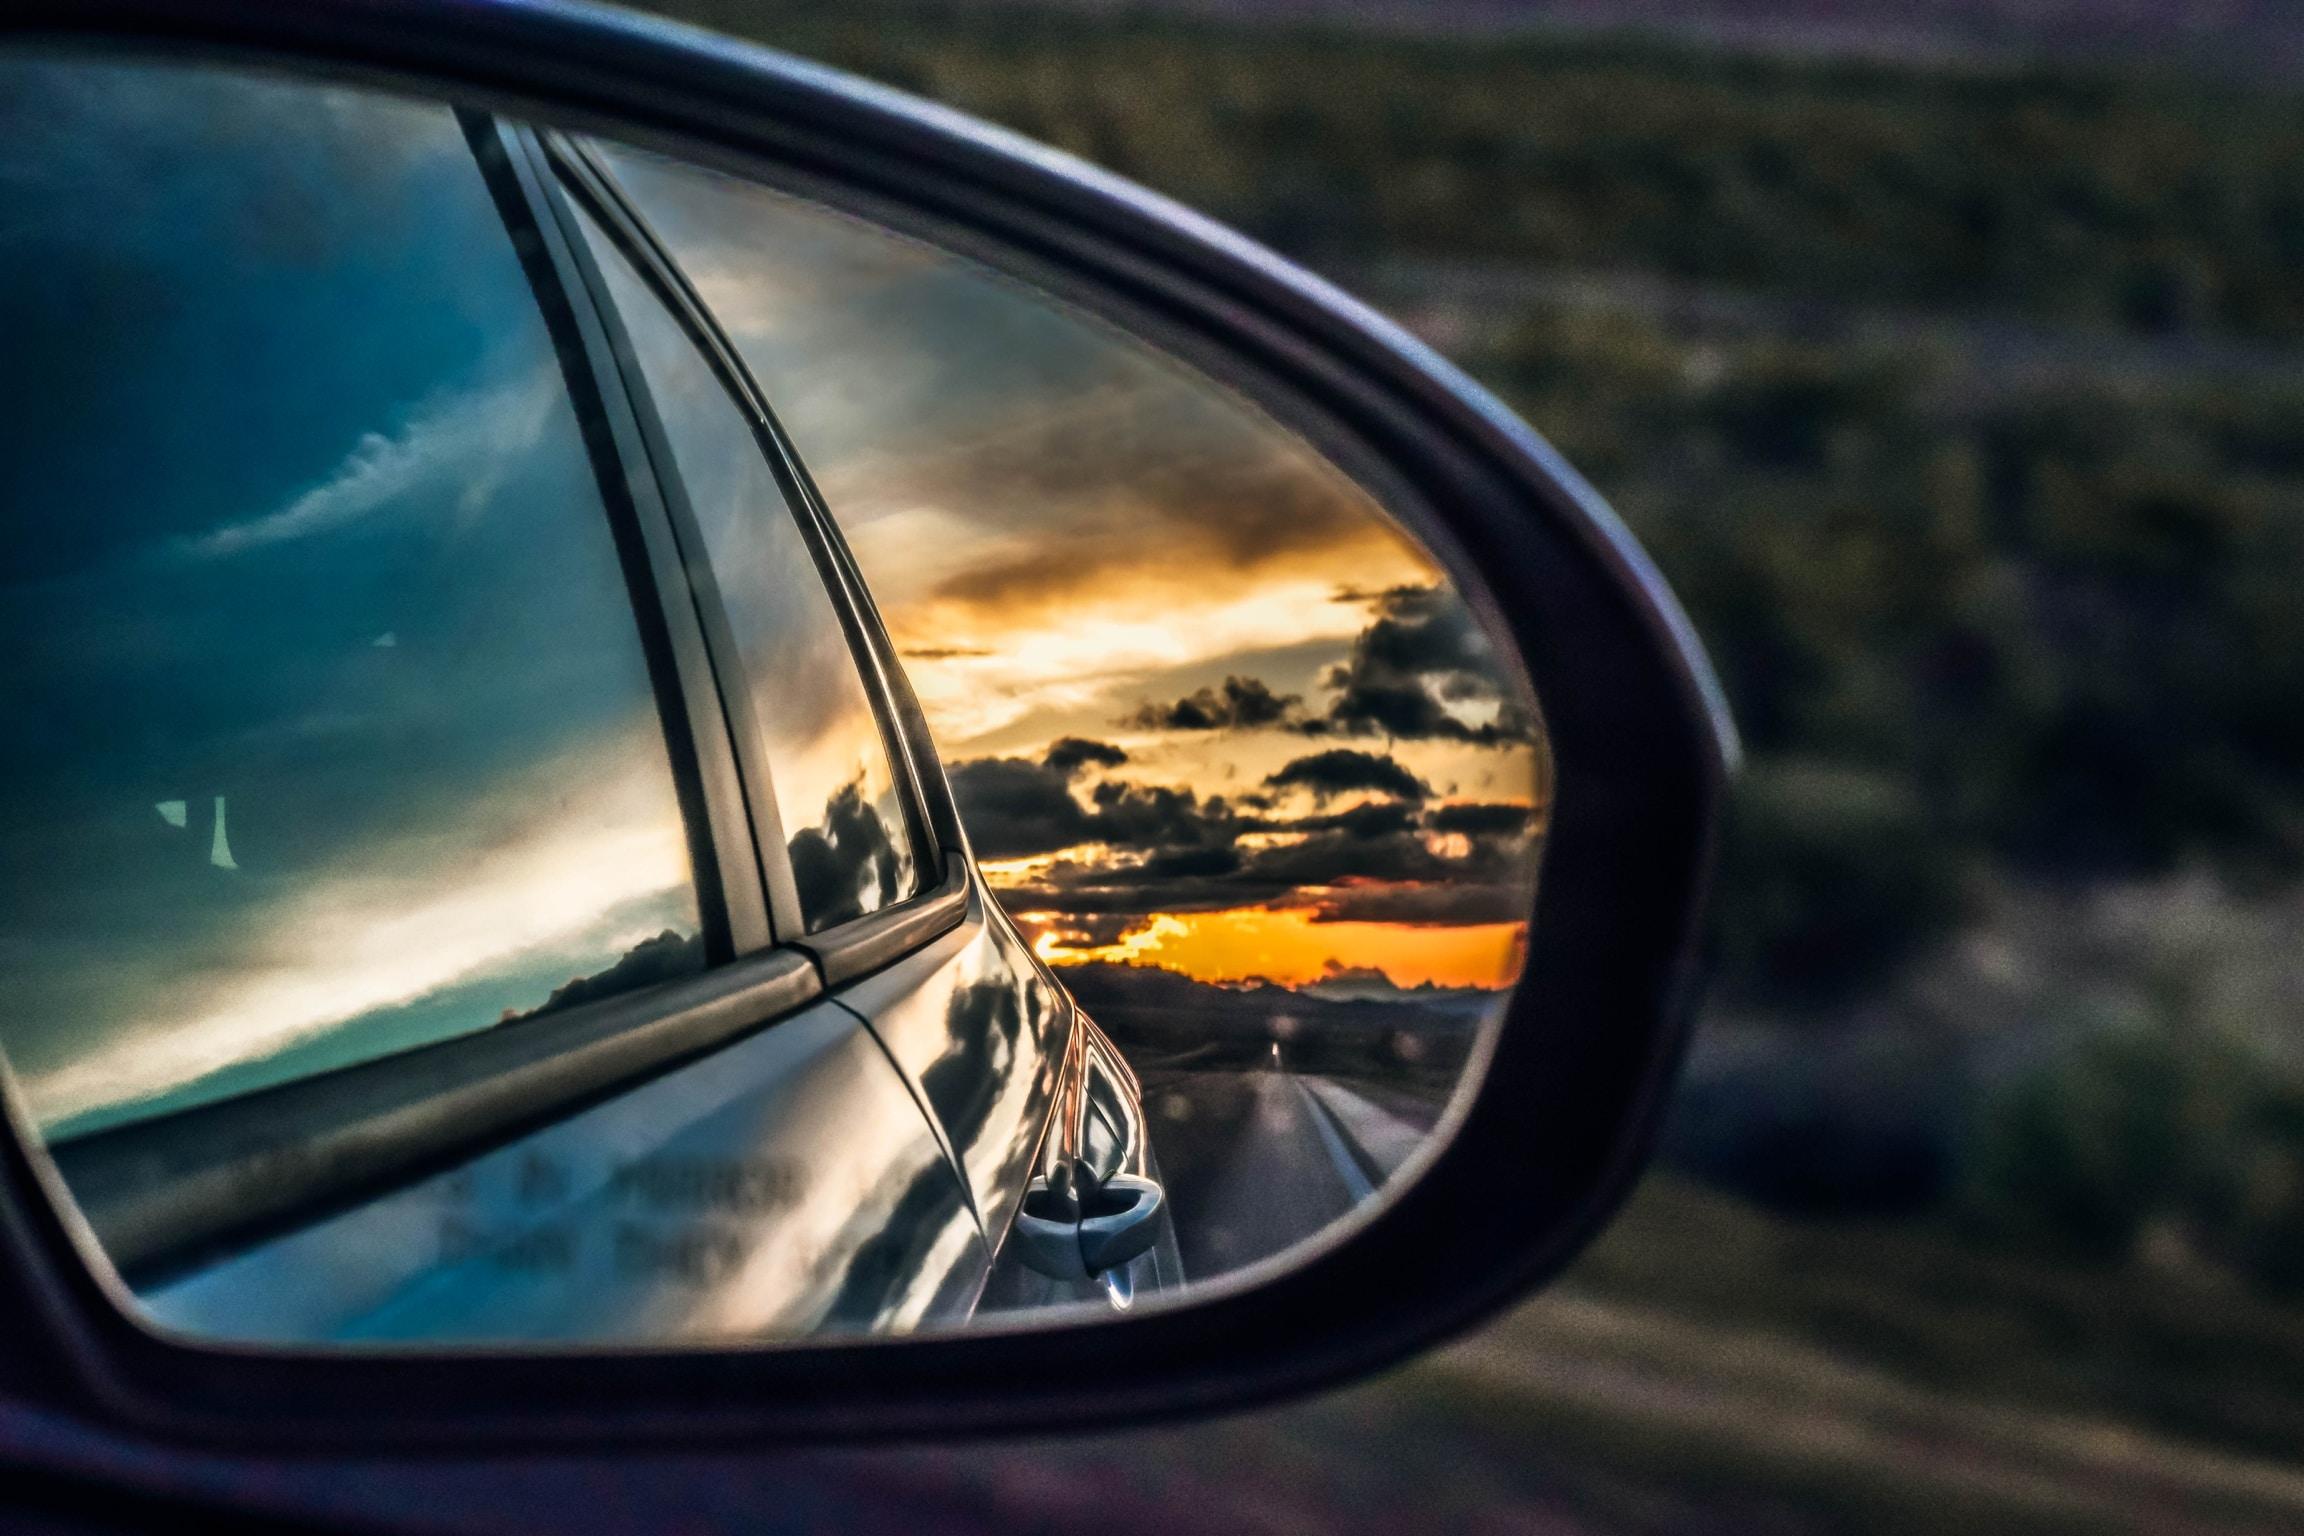 side mirror showing dark sky